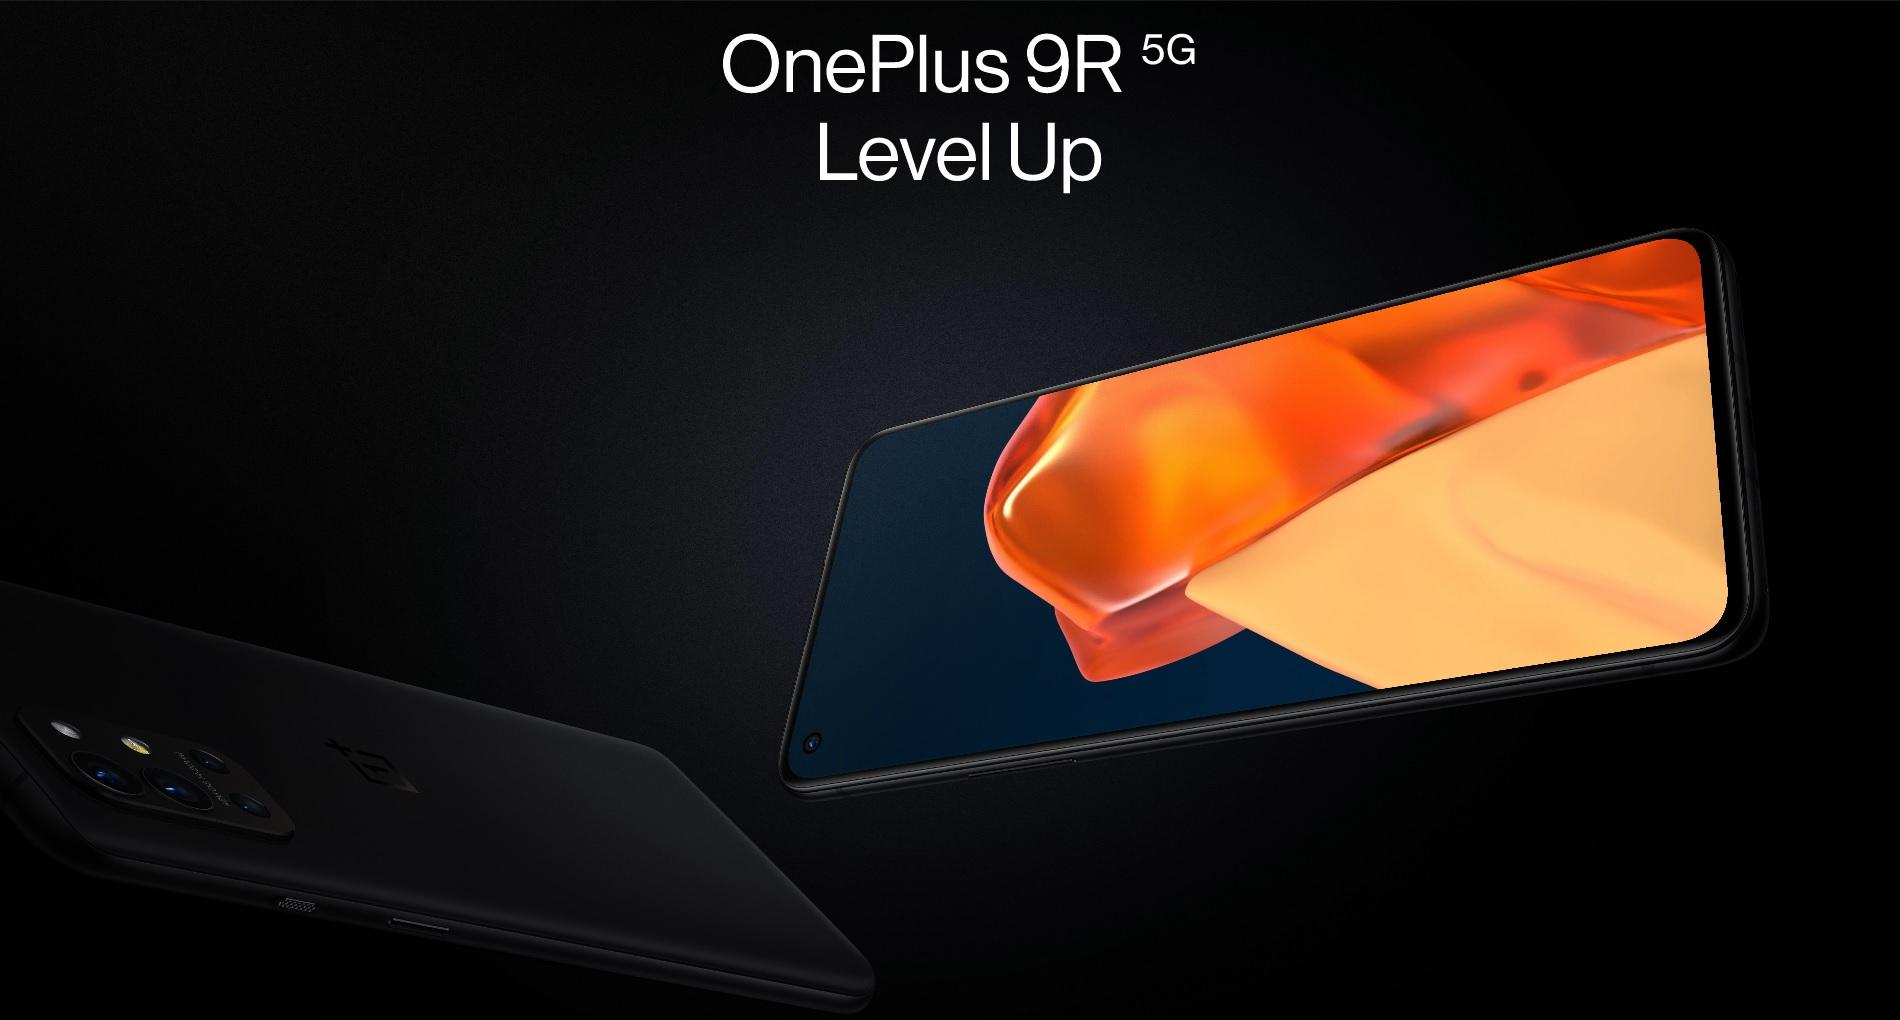 smartfon OnePlus 9R 5G smartphone